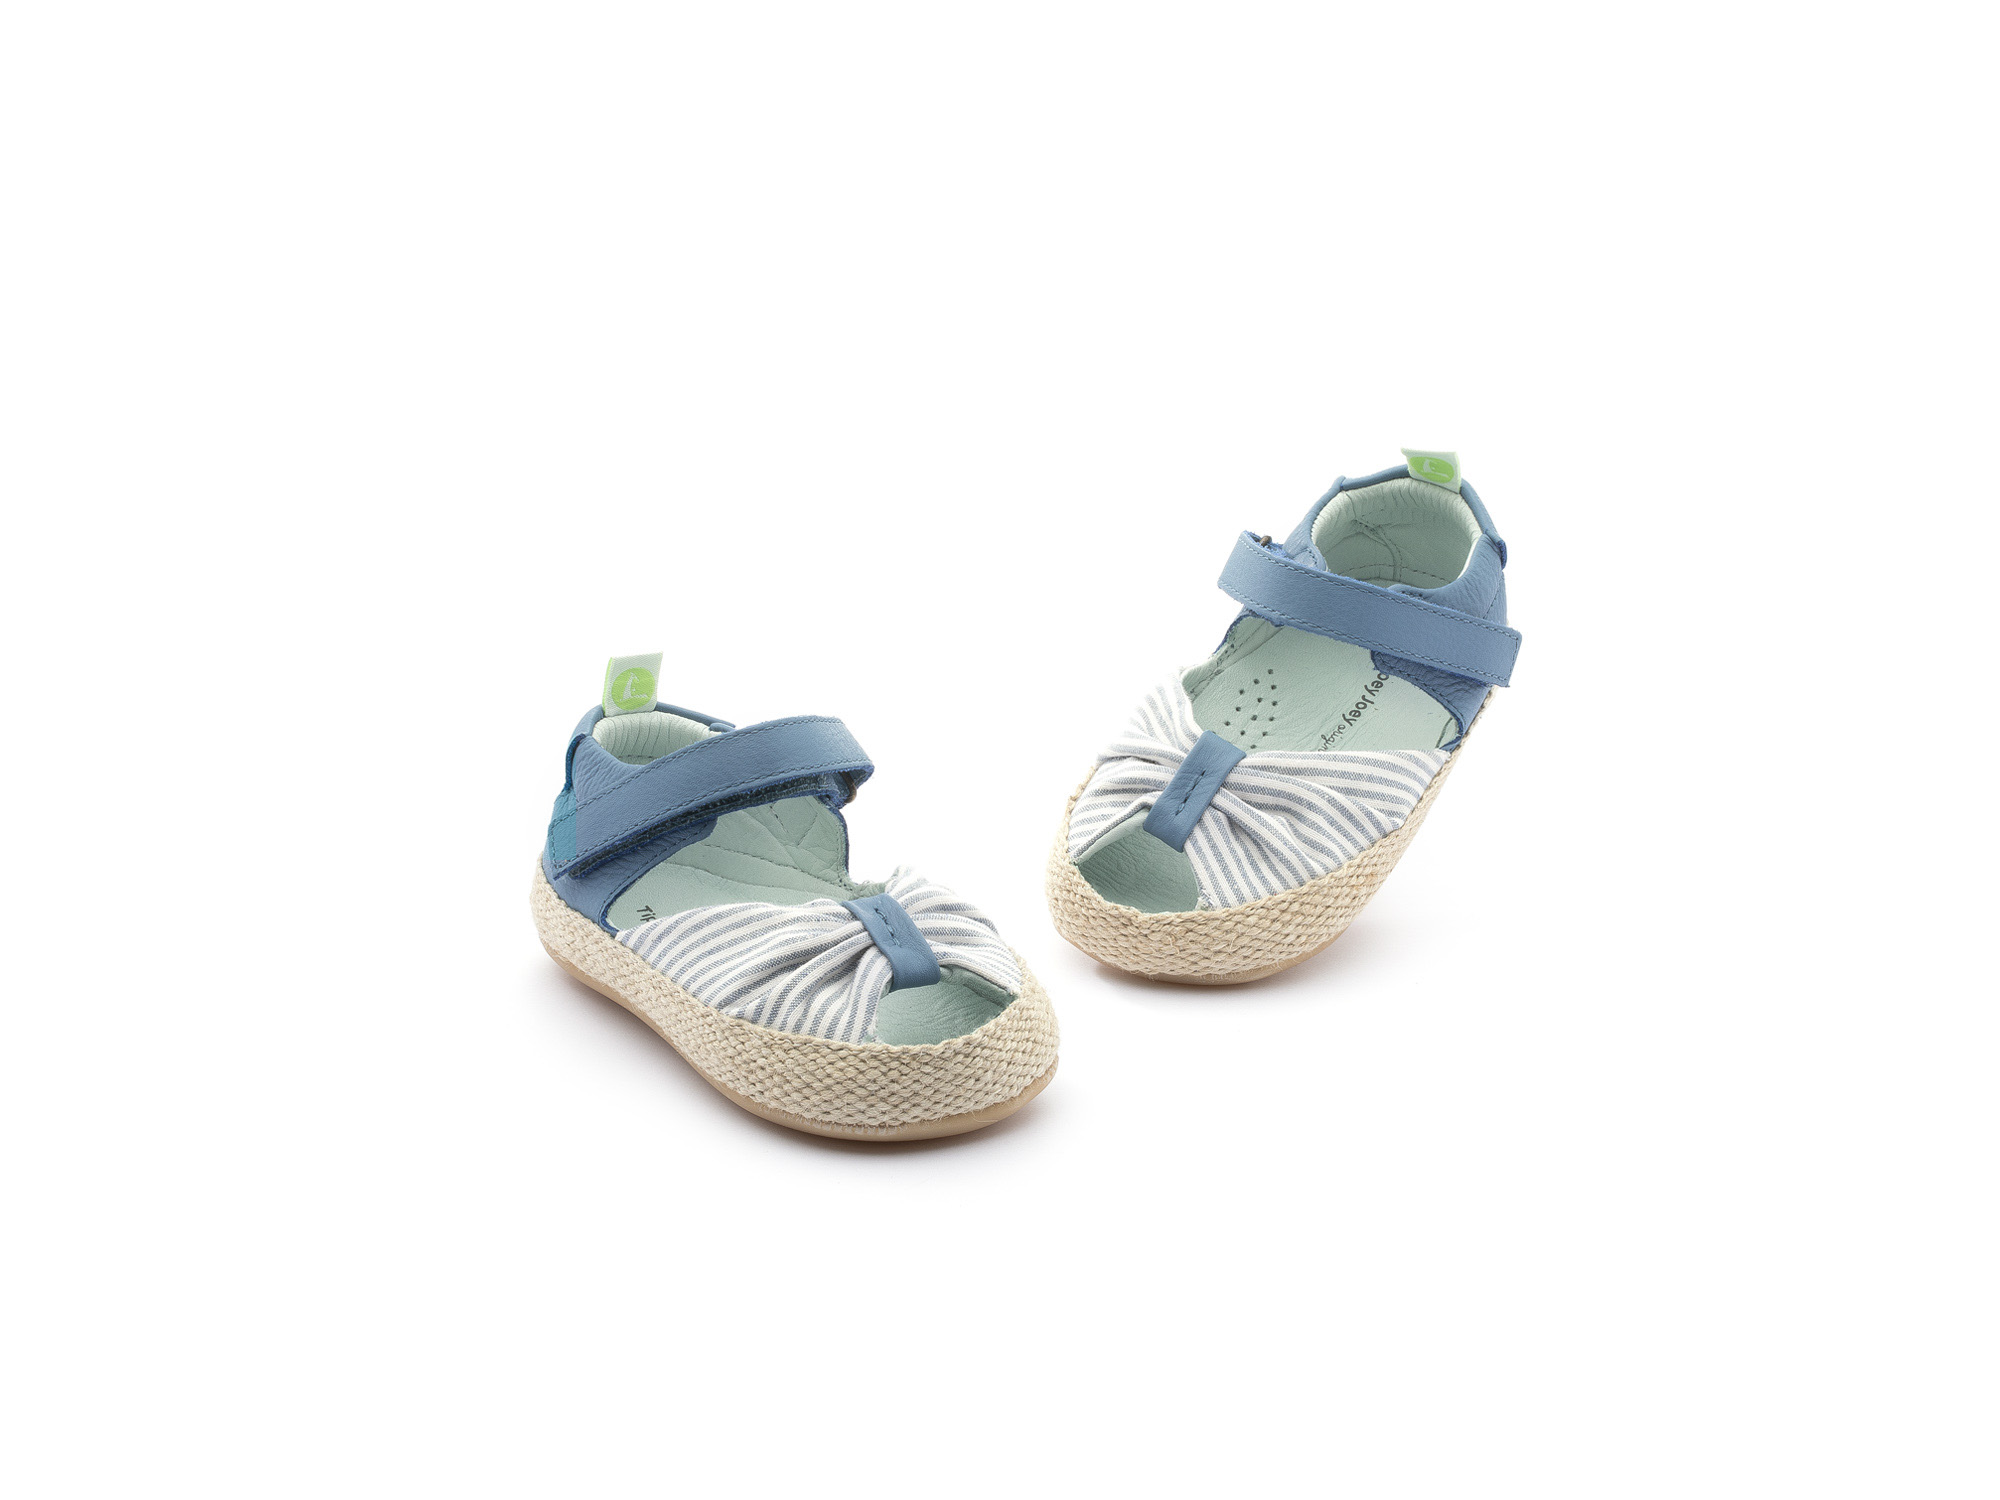 Sandália Coasty Light Navy Stripe Canvas/ Denim Baby 0 à 2 anos - 3